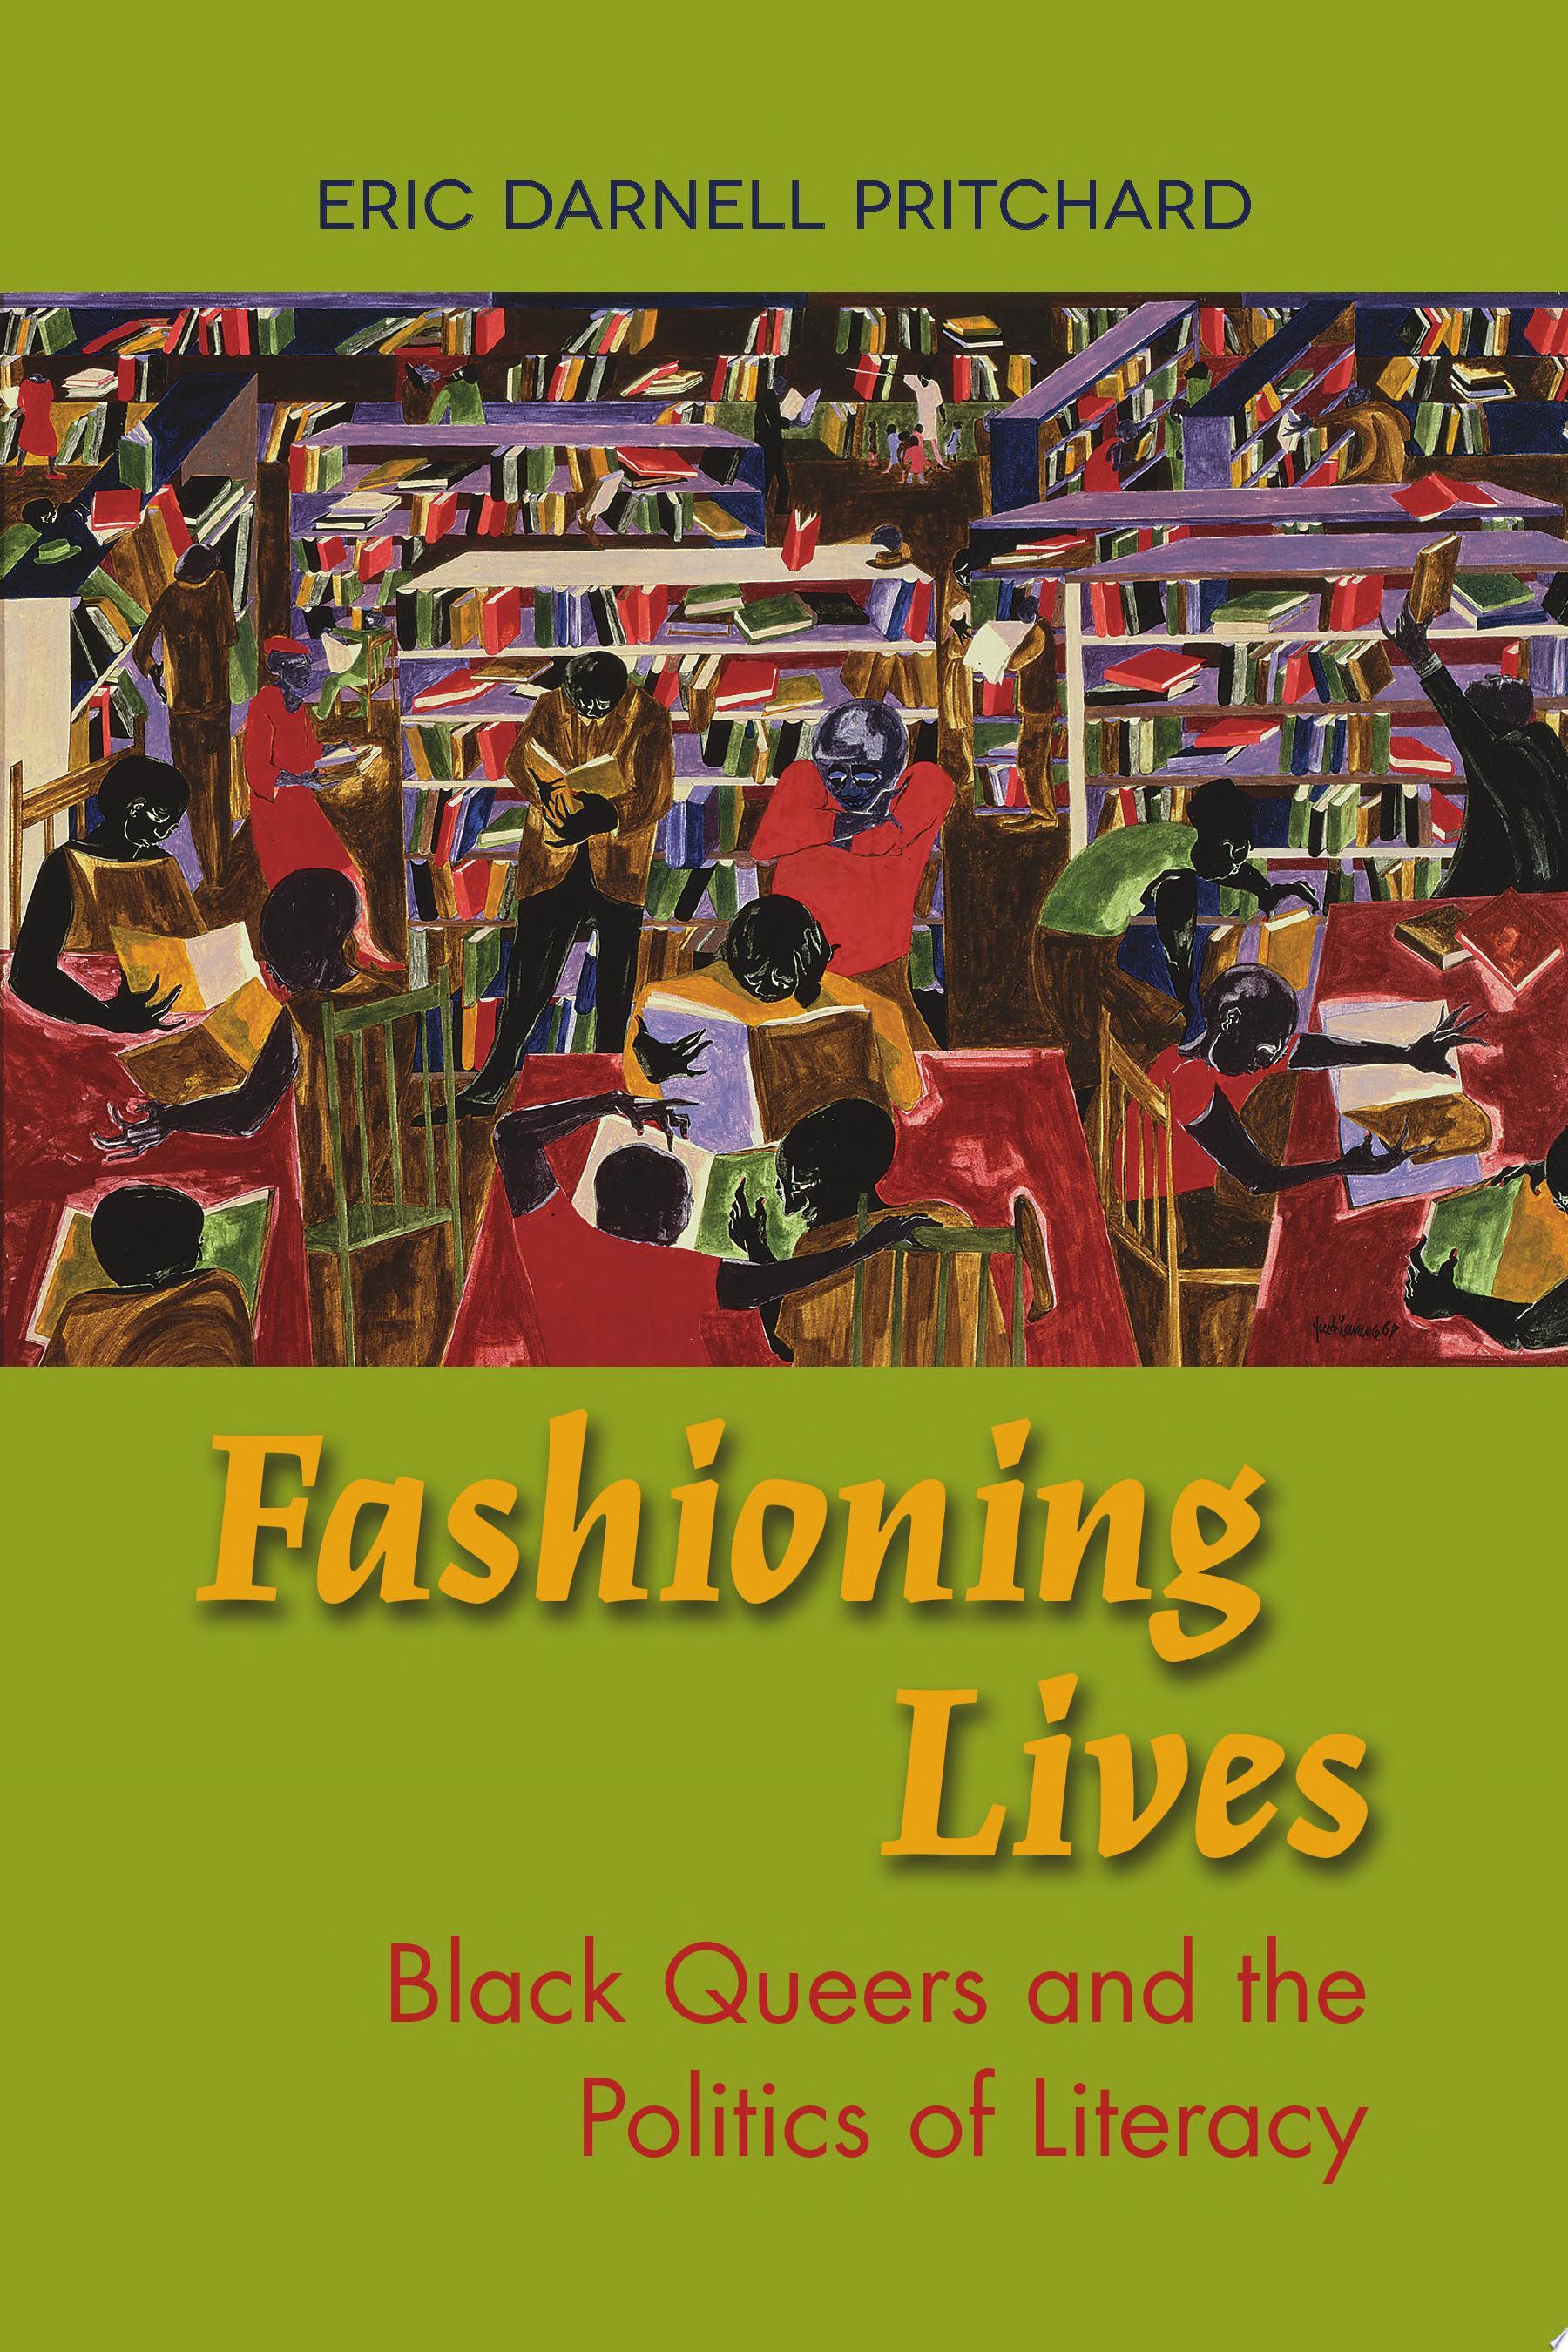 Fashioning Lives